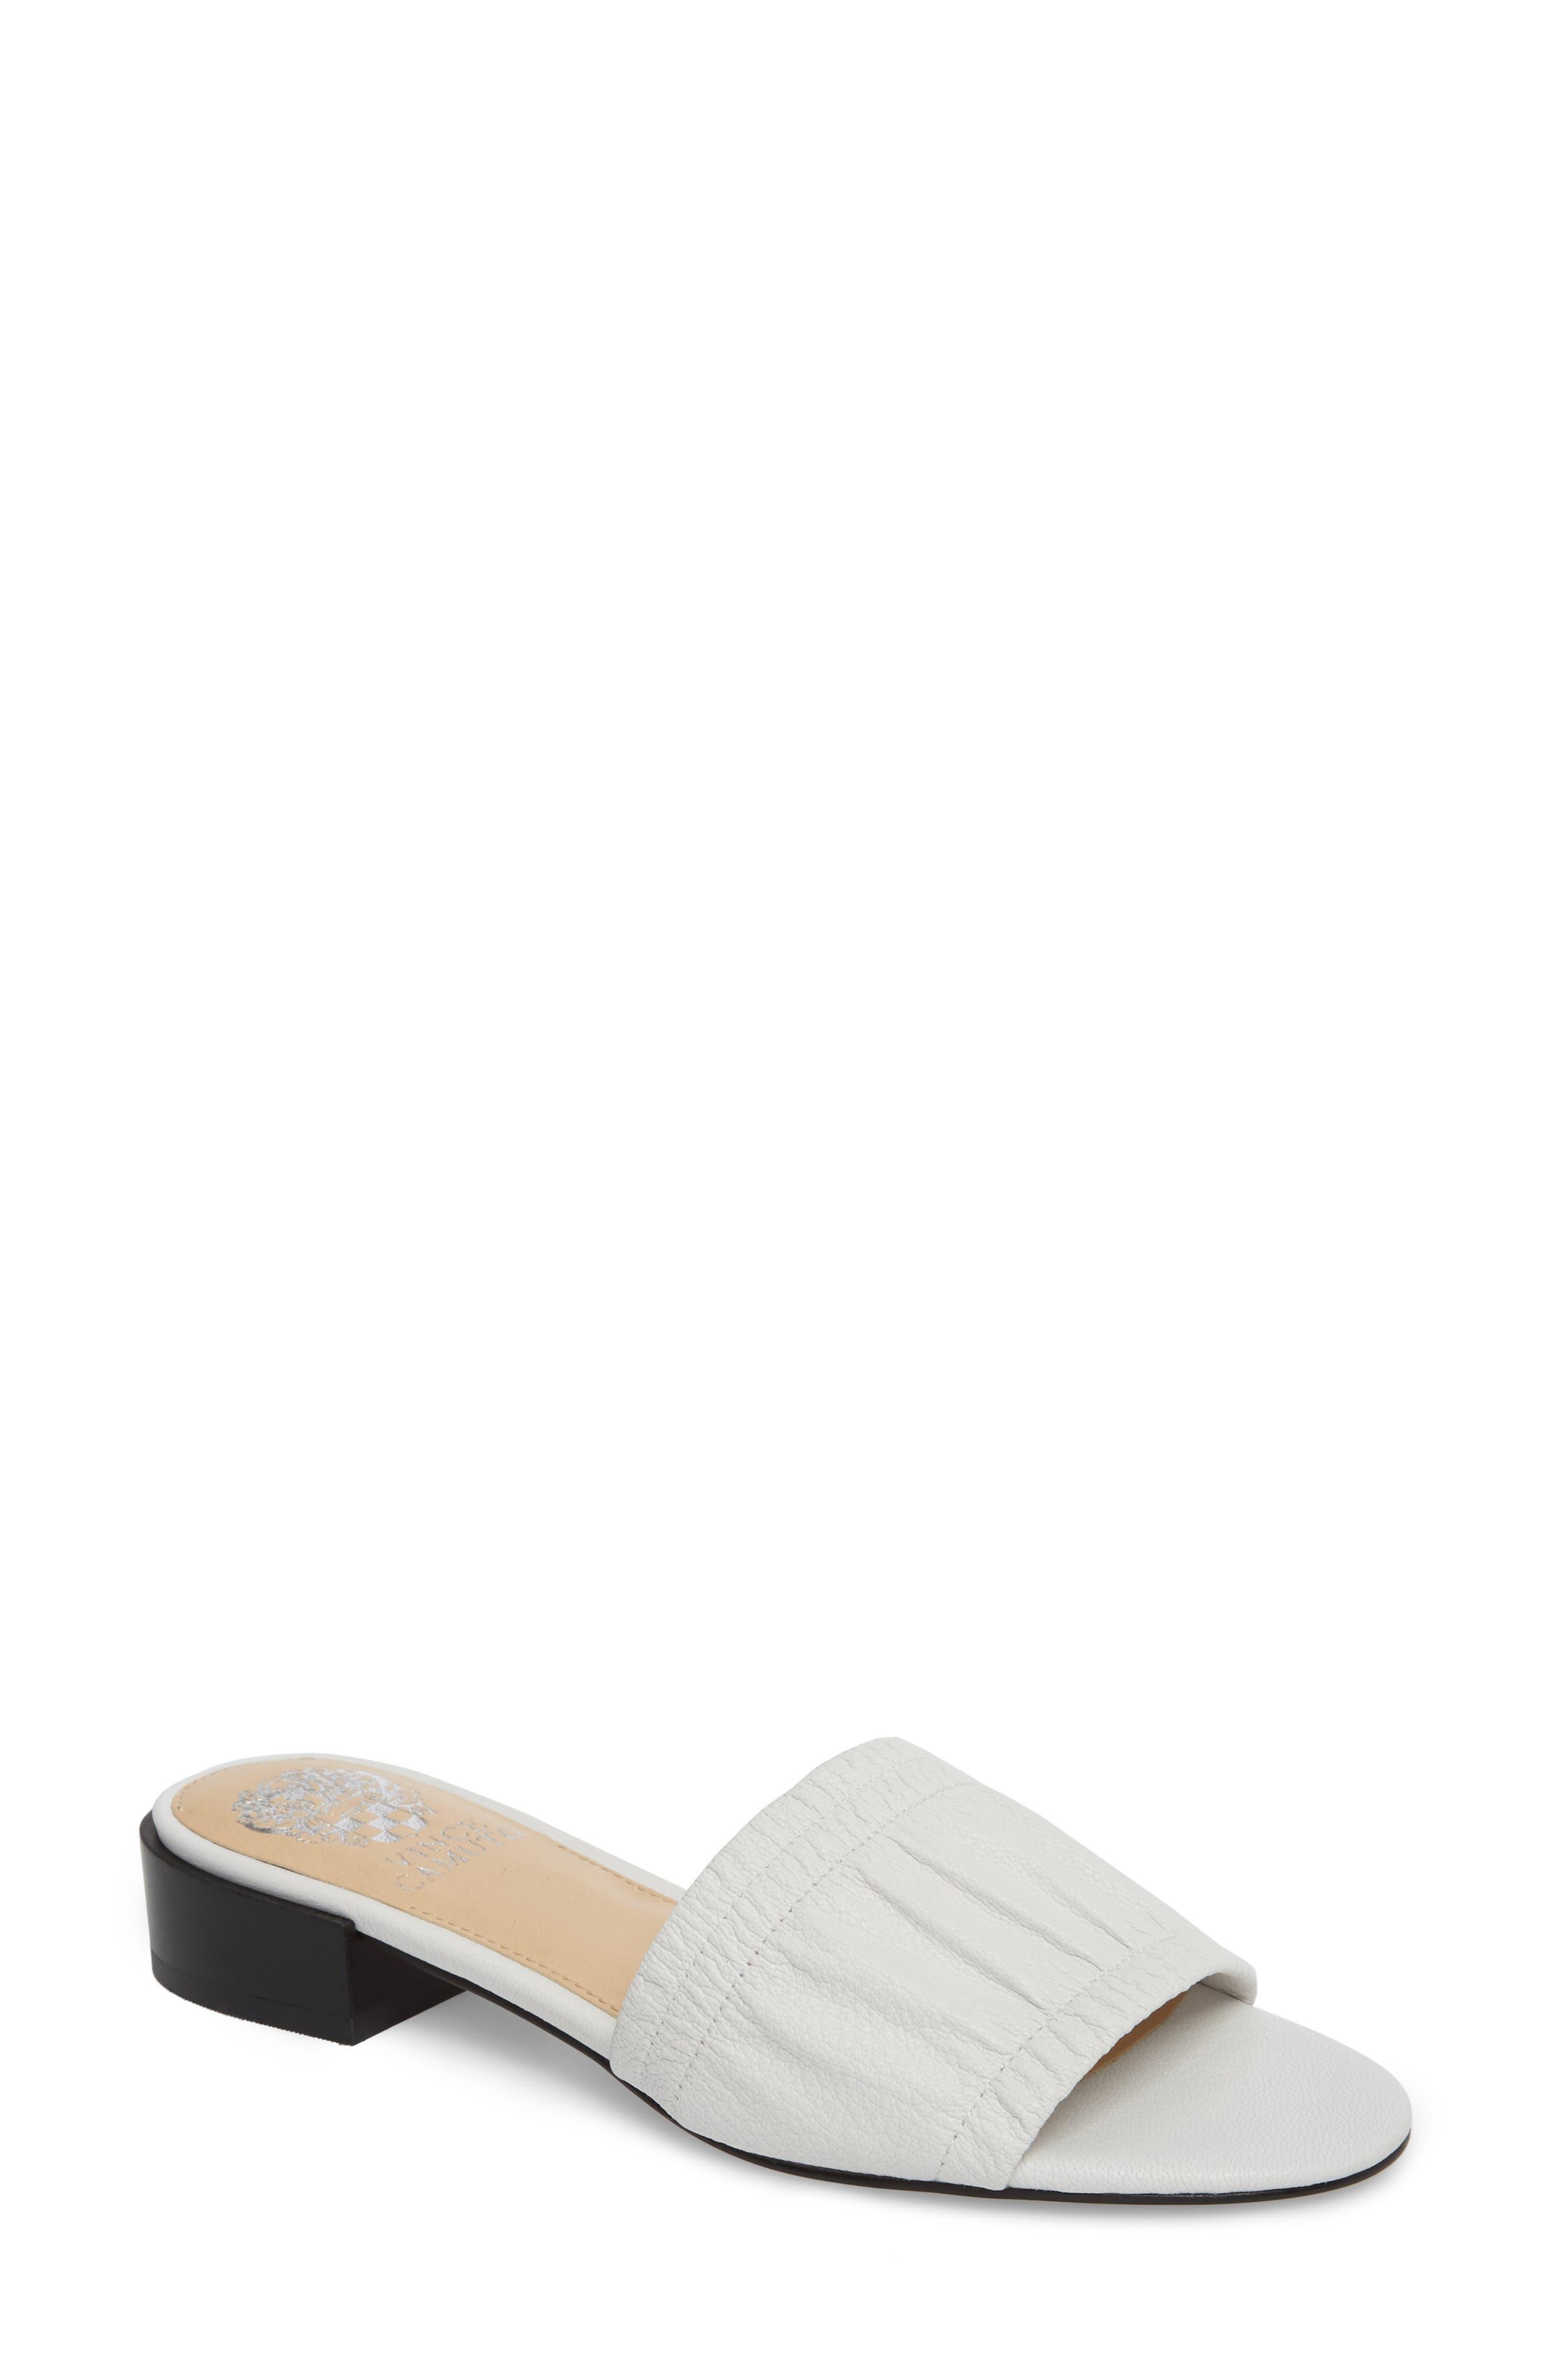 Nanita Pleated Slide Sandal,                             Main thumbnail 1, color,